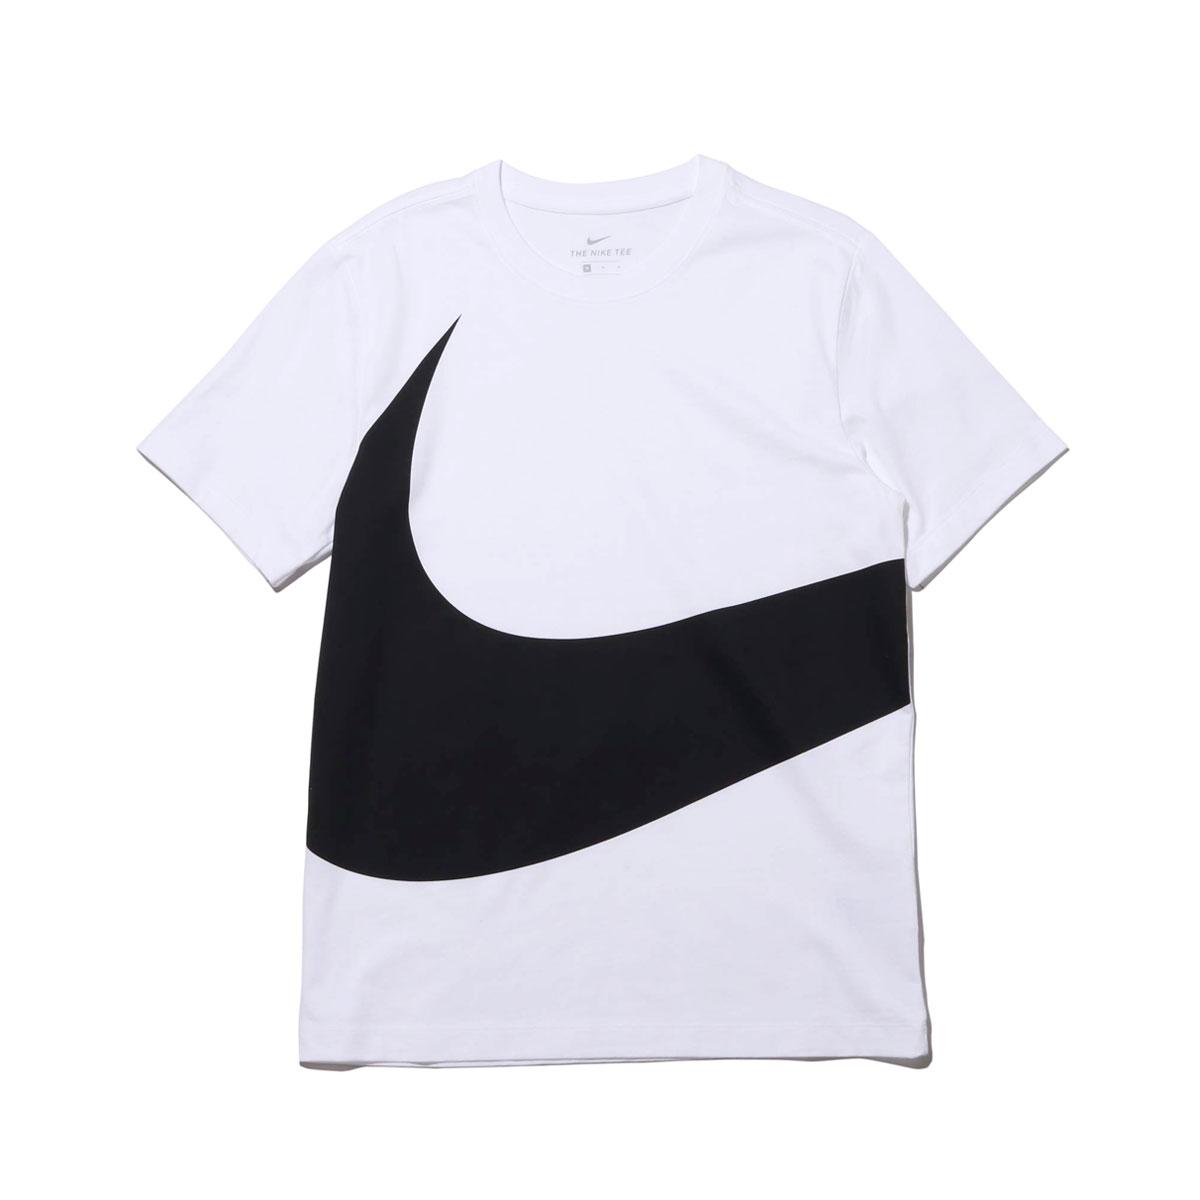 844e8a18 Kinetics: NIKE AS M NSW TEE HBR SWOOSH 1 (WHITE/BLACK) (Nike HBR ...